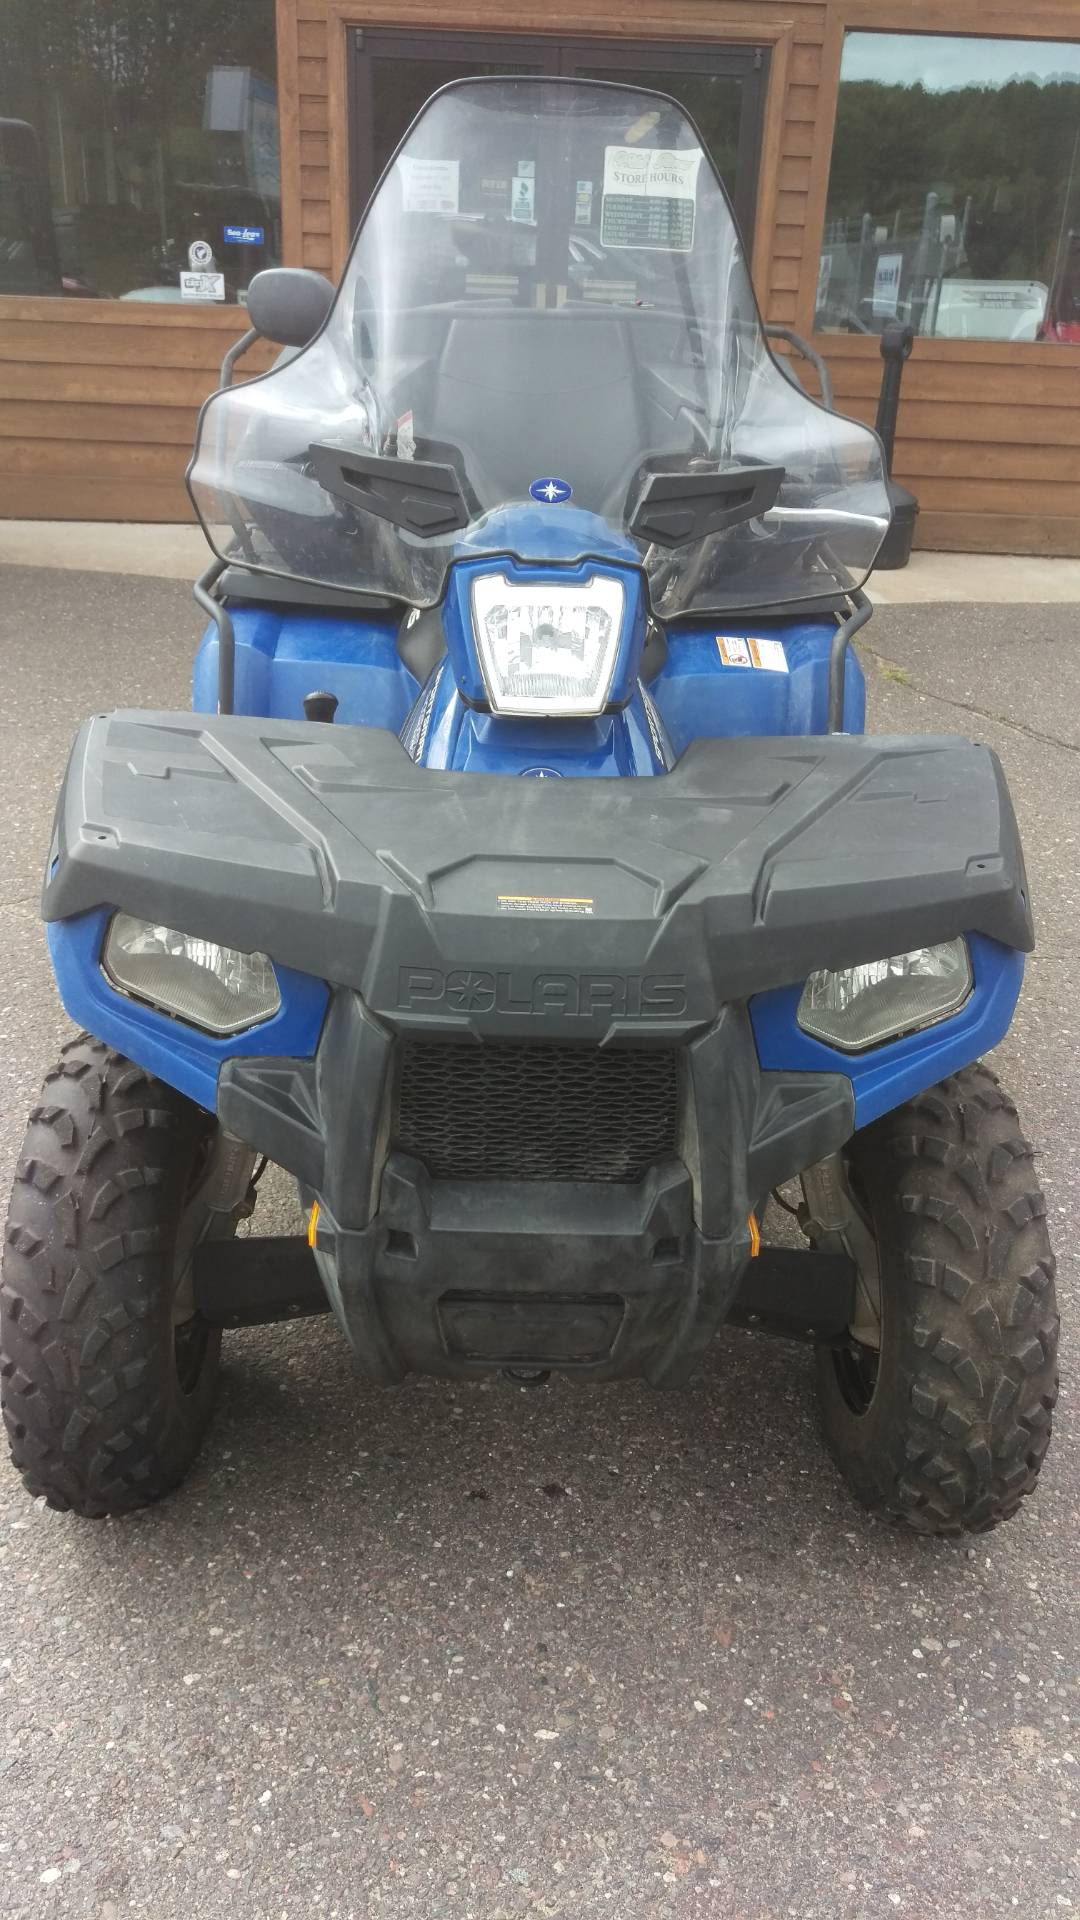 2012 Polaris Sportsman® 400 H.O. in Trego, Wisconsin